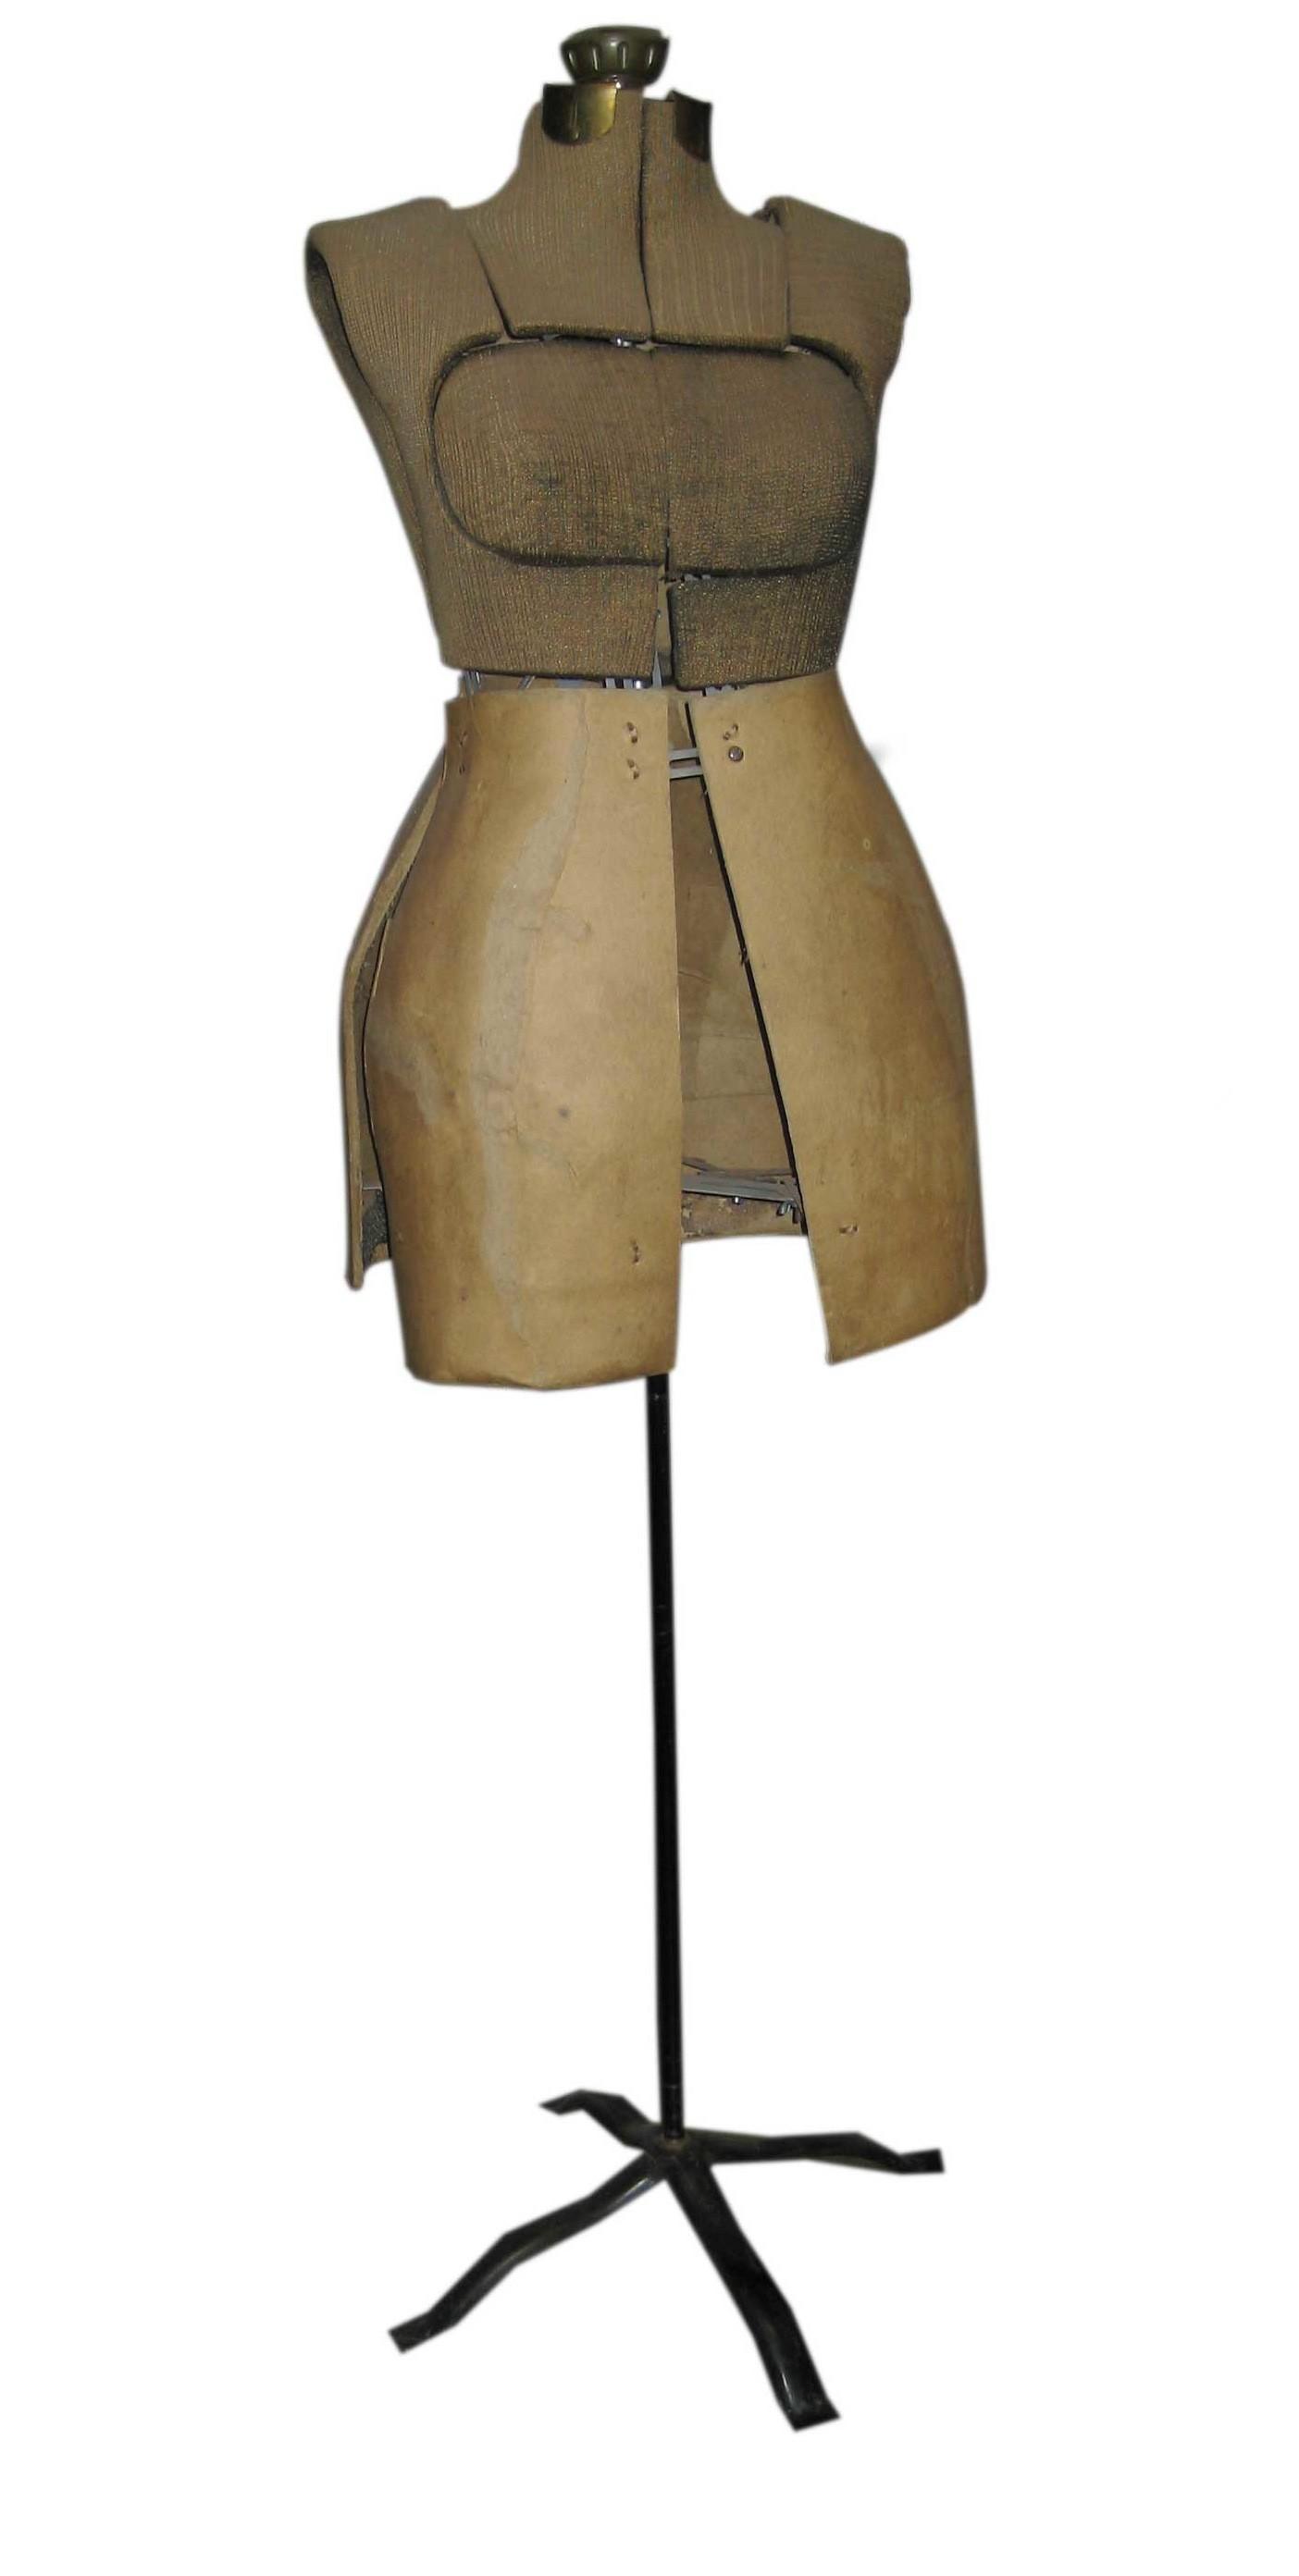 Antique Adjule Dress Form With